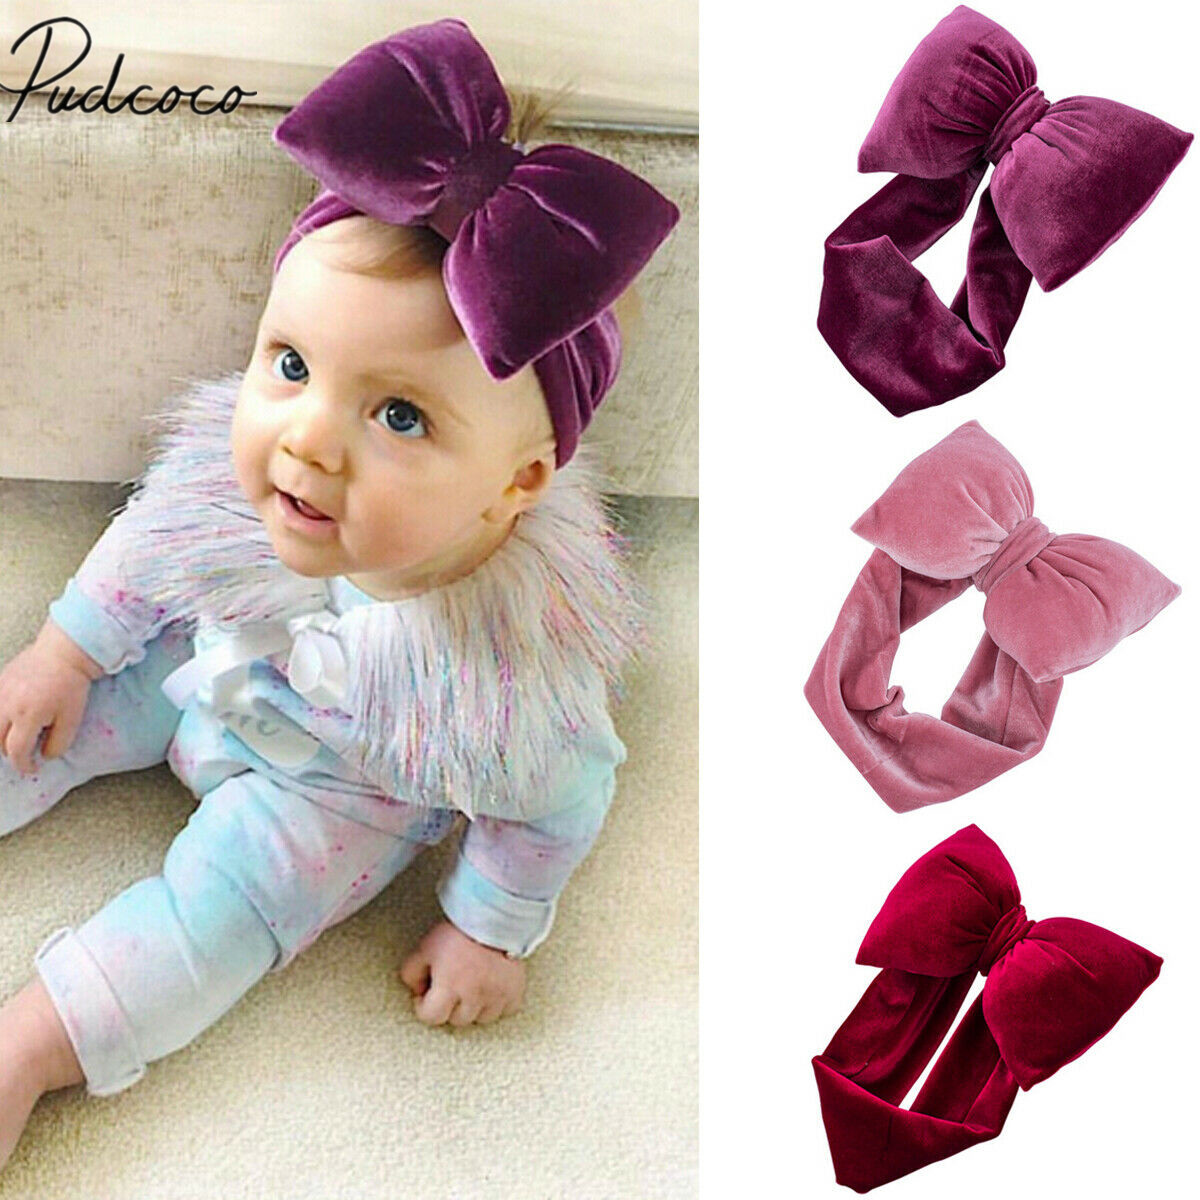 Cute Newborn Baby Girl Toddler Kids Bow Headband Hair Band Headwear Photo Props